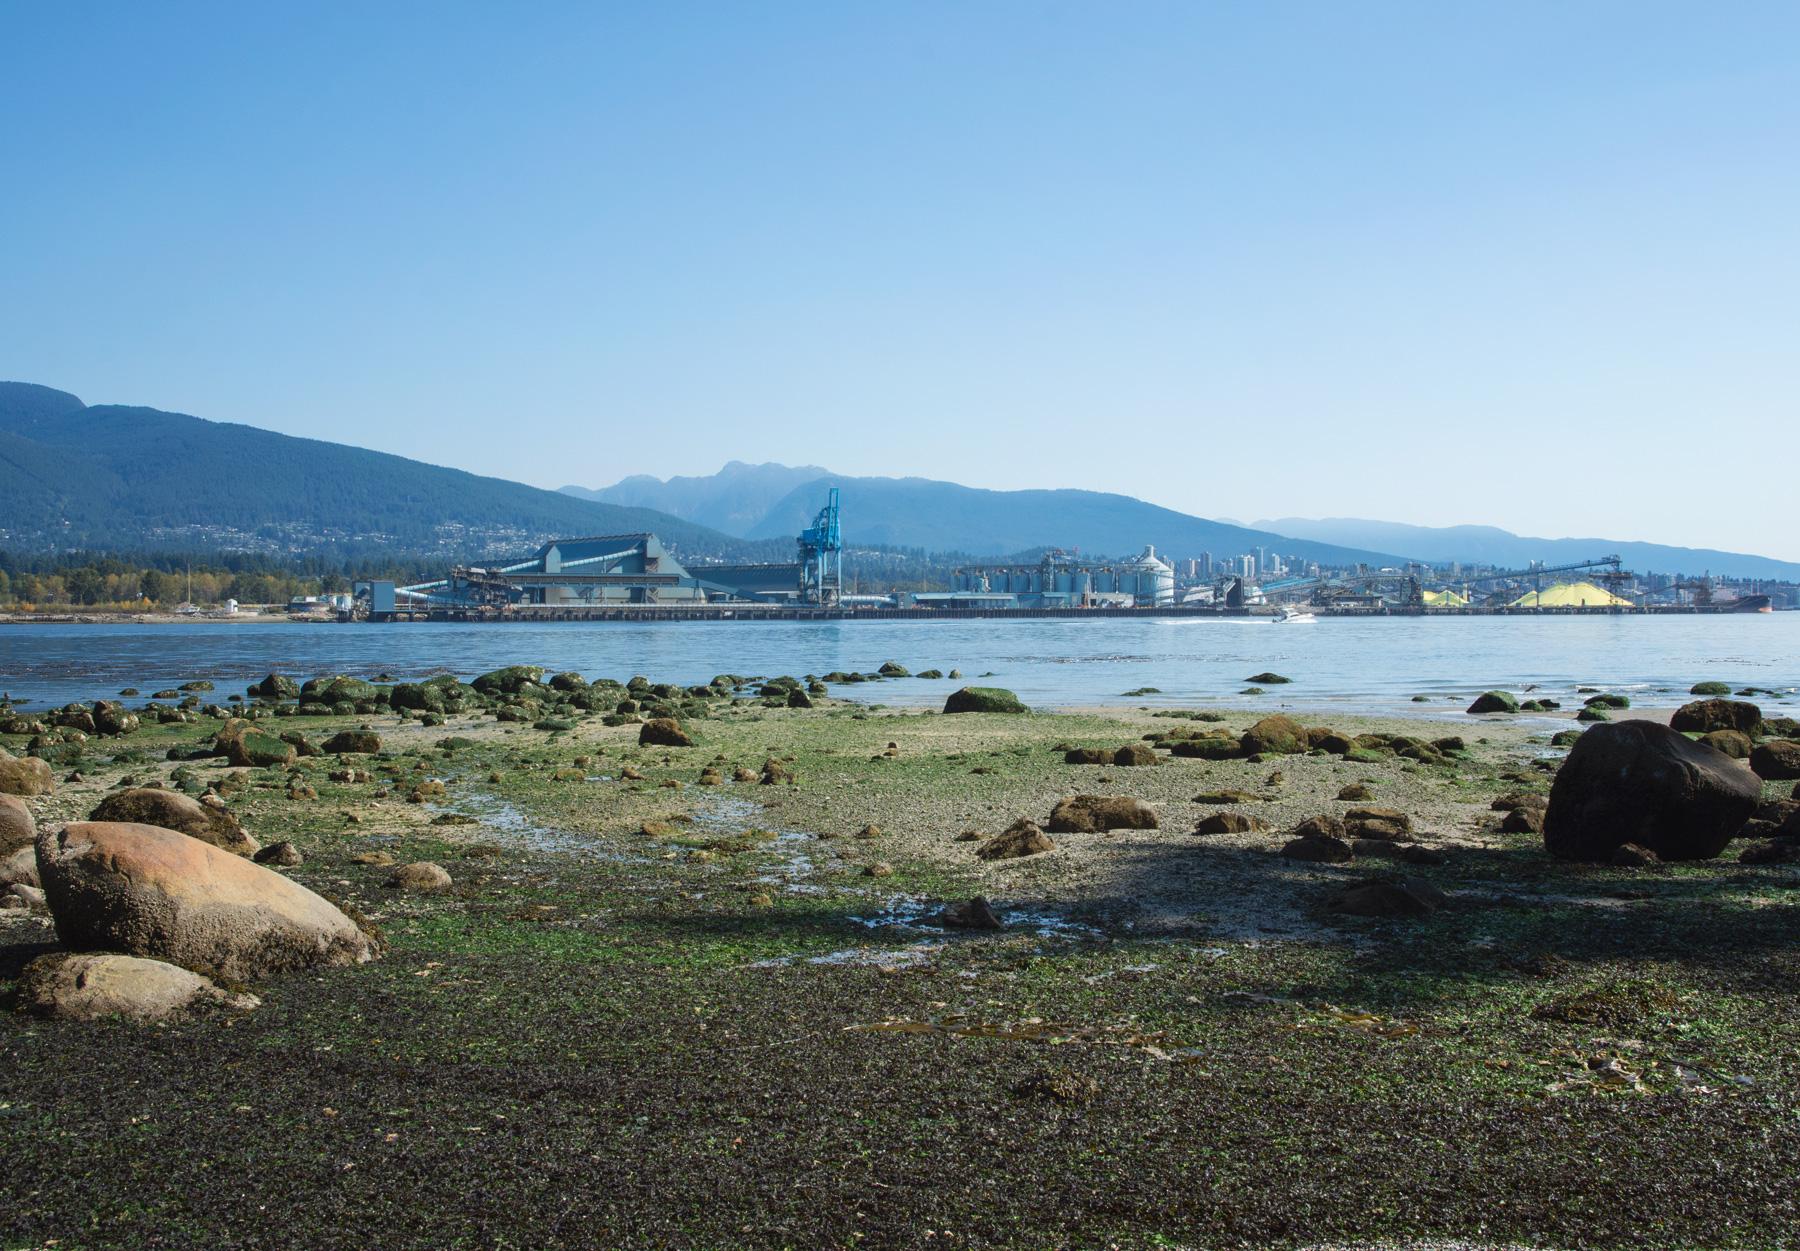 View onto shoreline